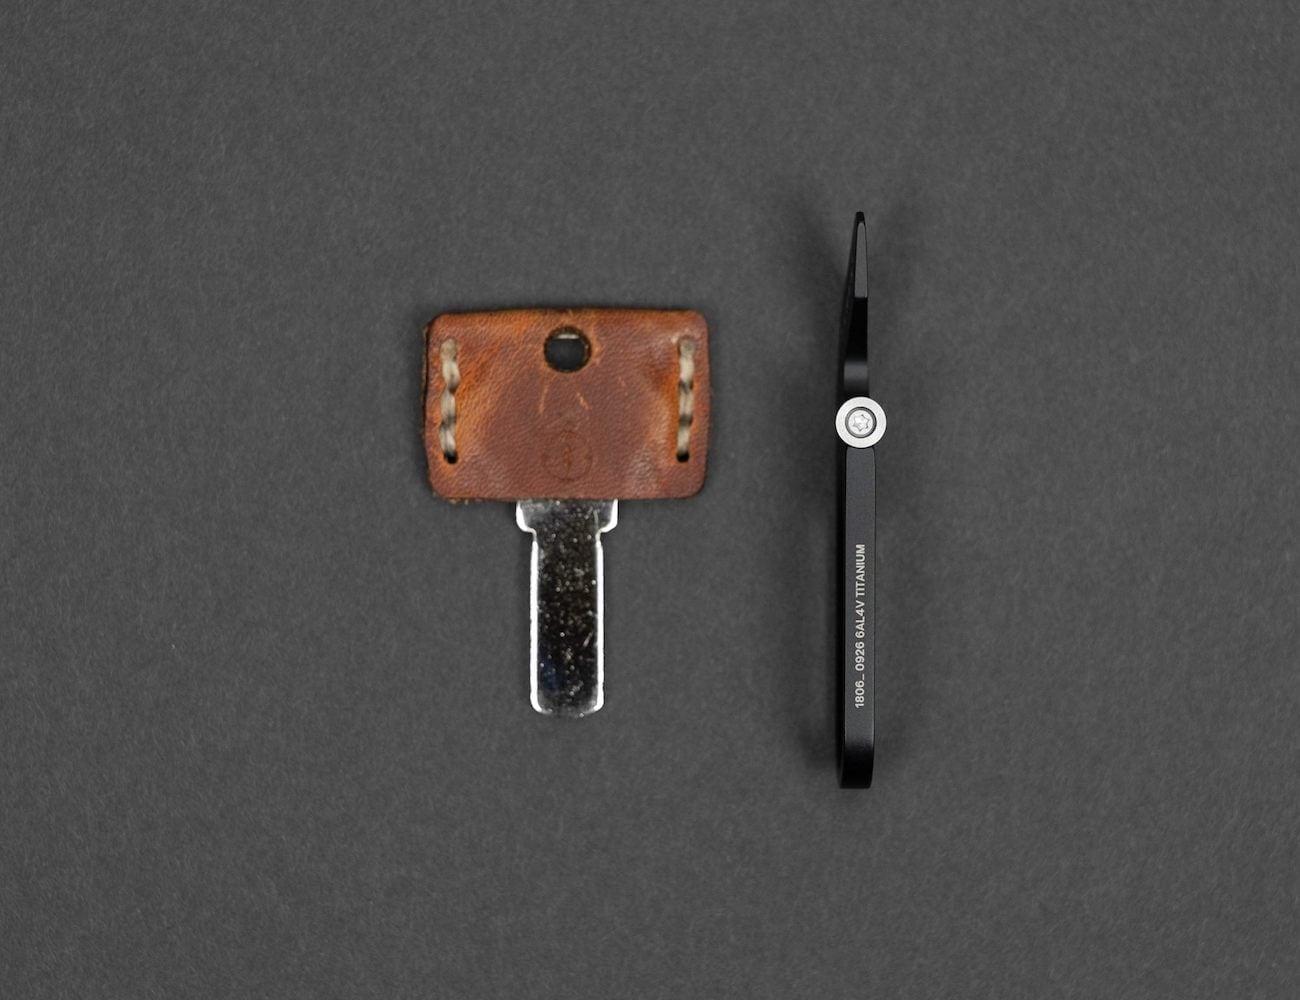 James Brand Halifax Multifunctional Keychain Tool